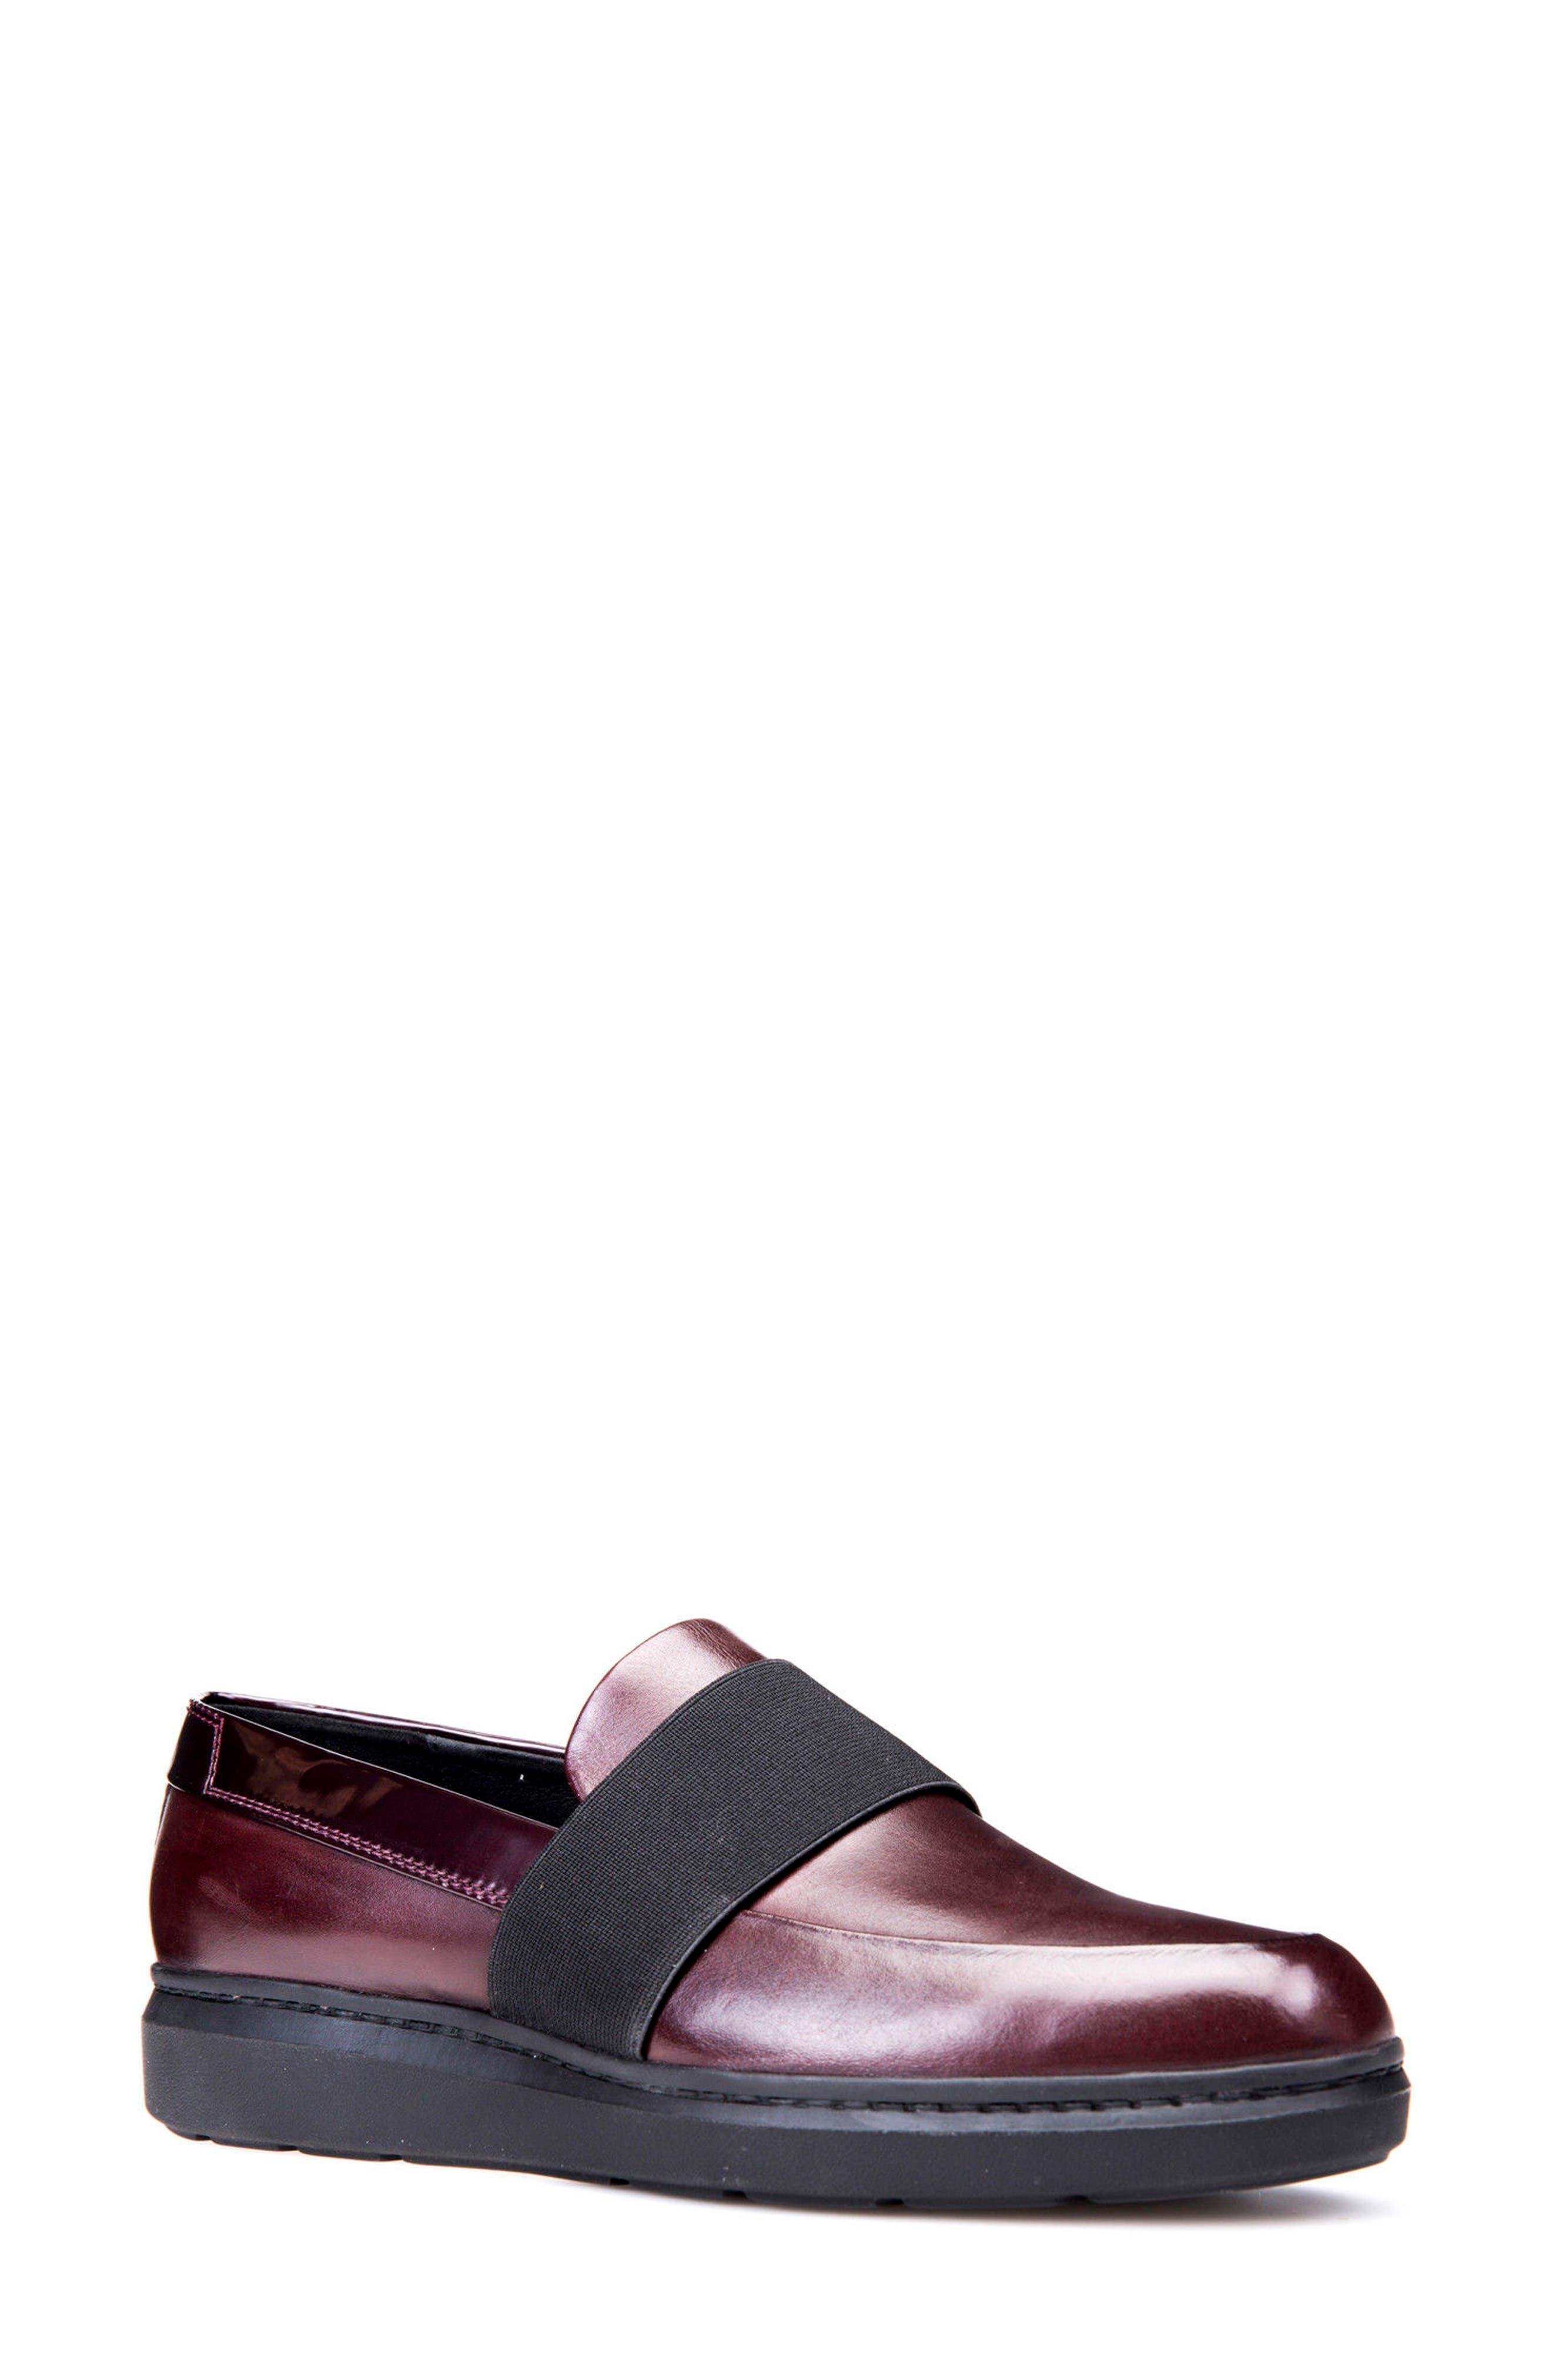 Jerrica Loafer,                             Main thumbnail 1, color,                             Dark Burgundy Leather